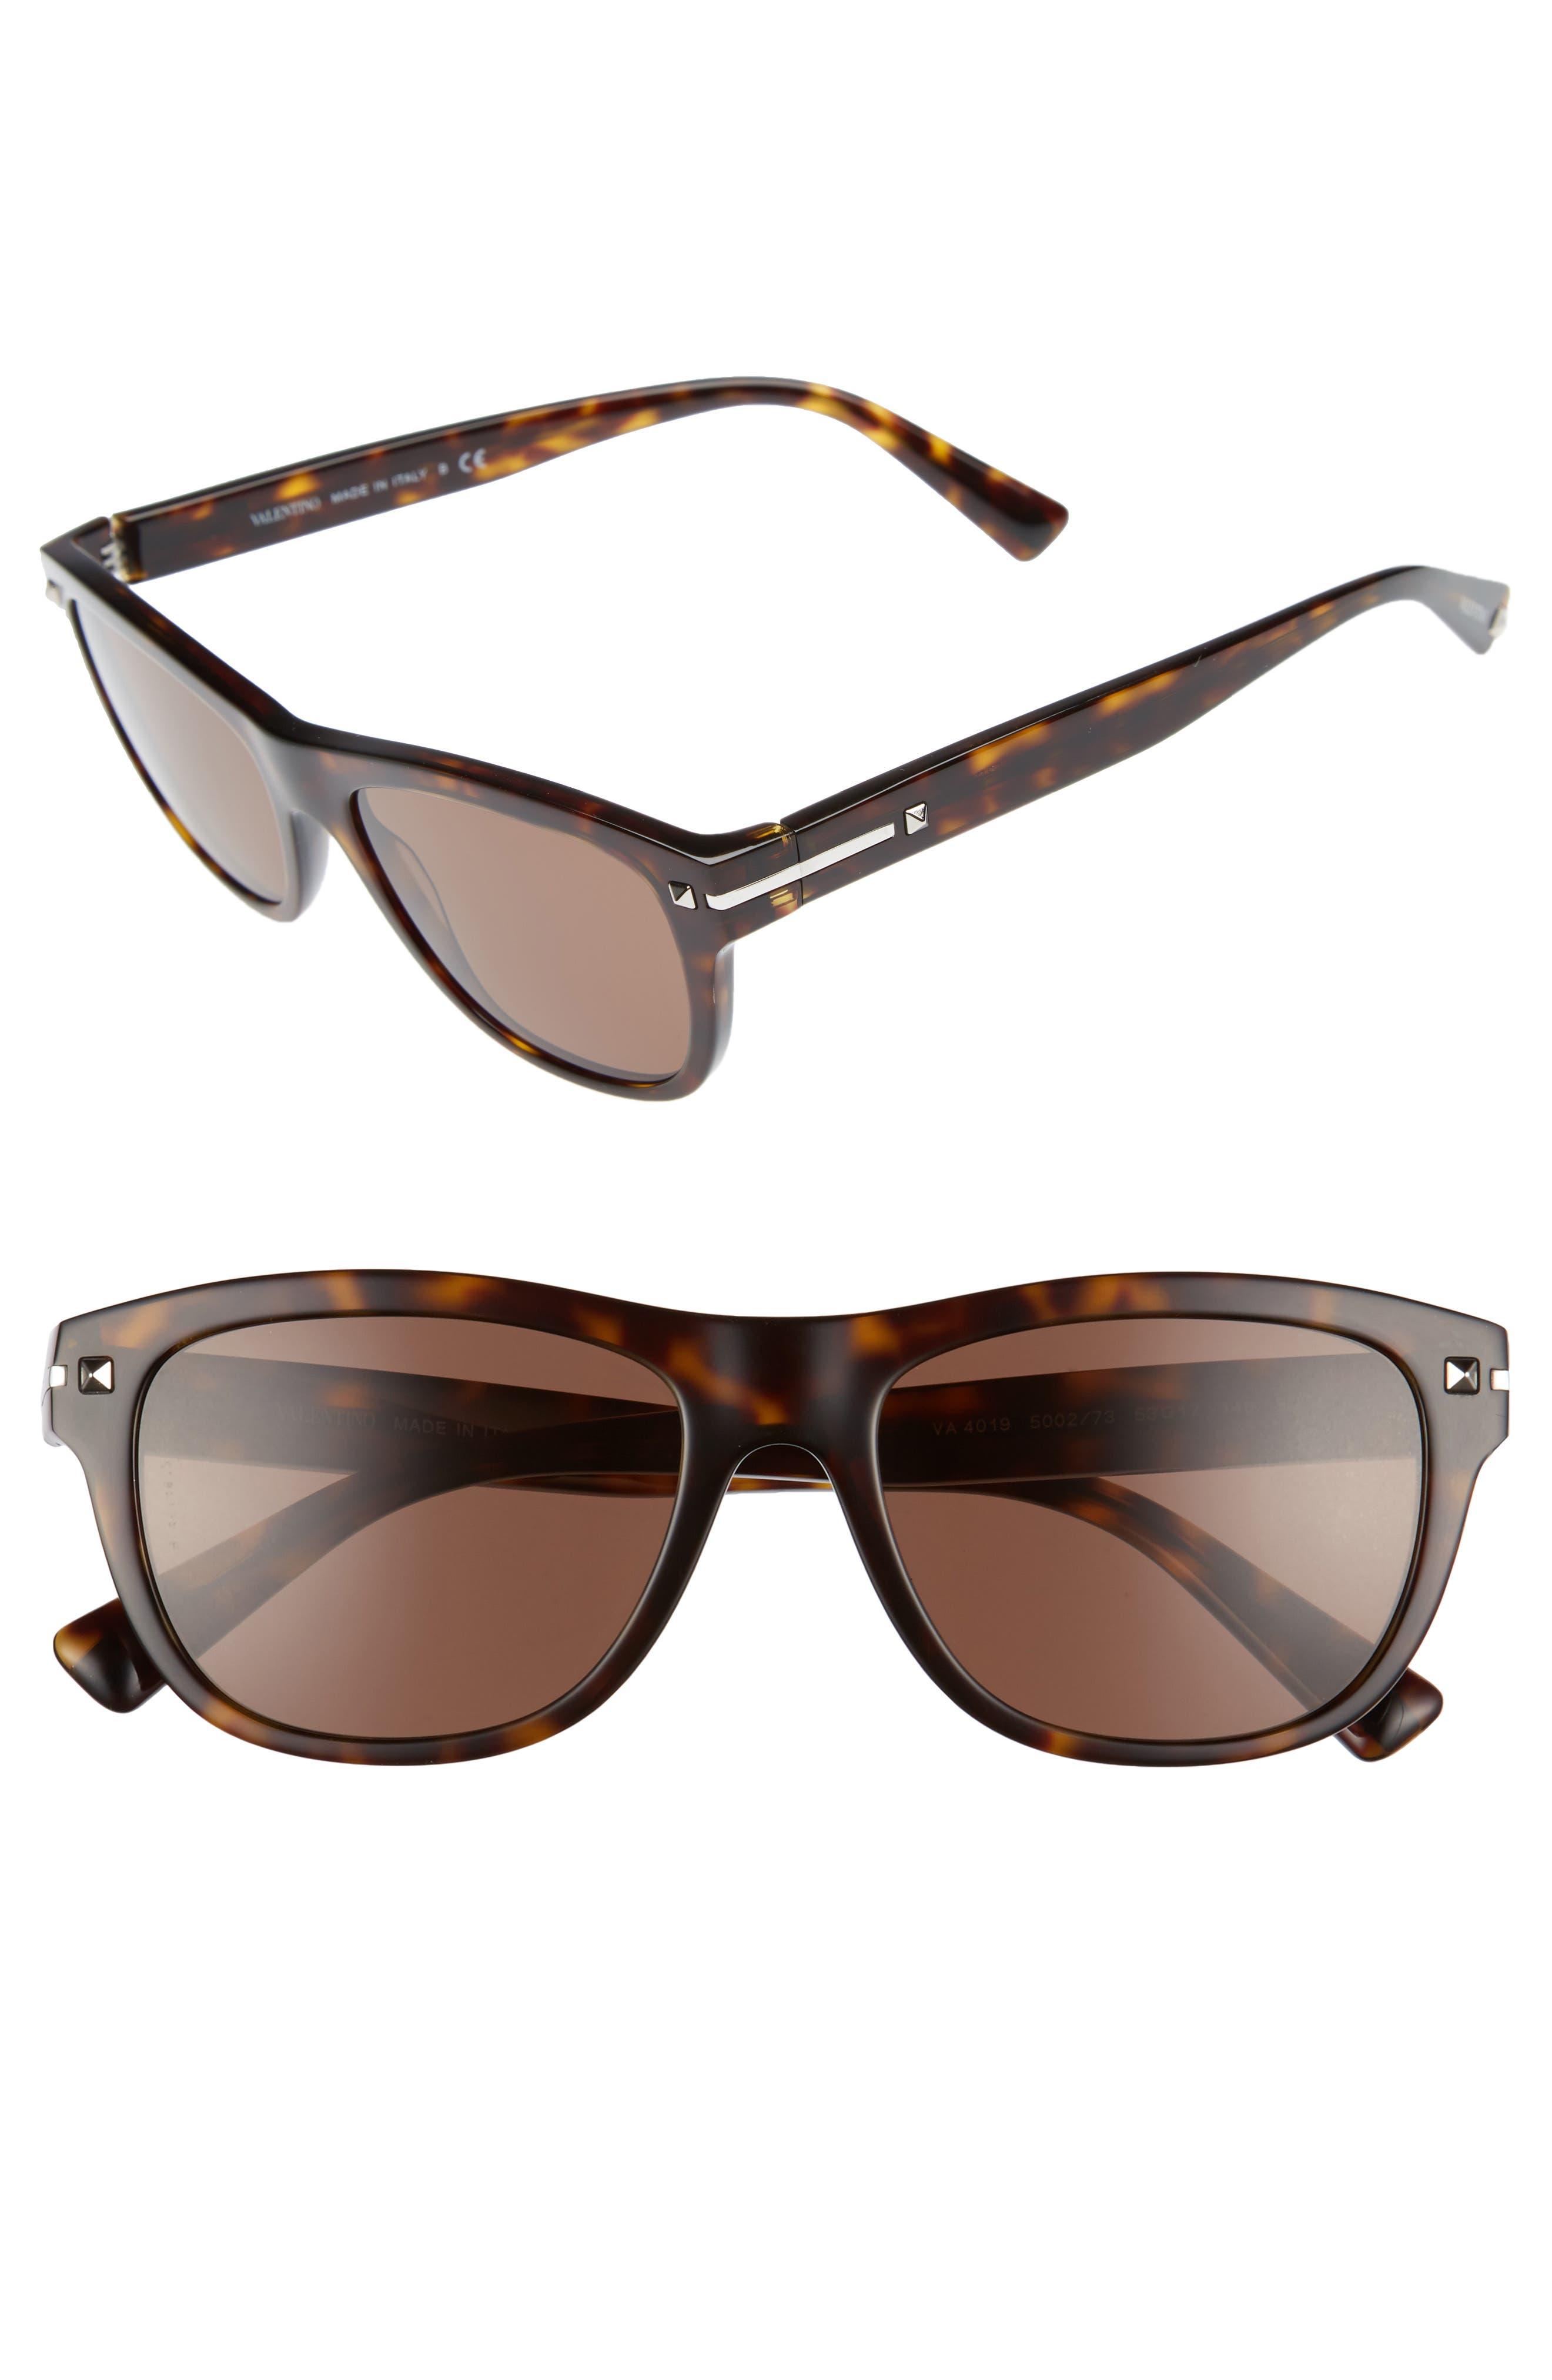 Main Image - Valentino 53mm Sunglasses